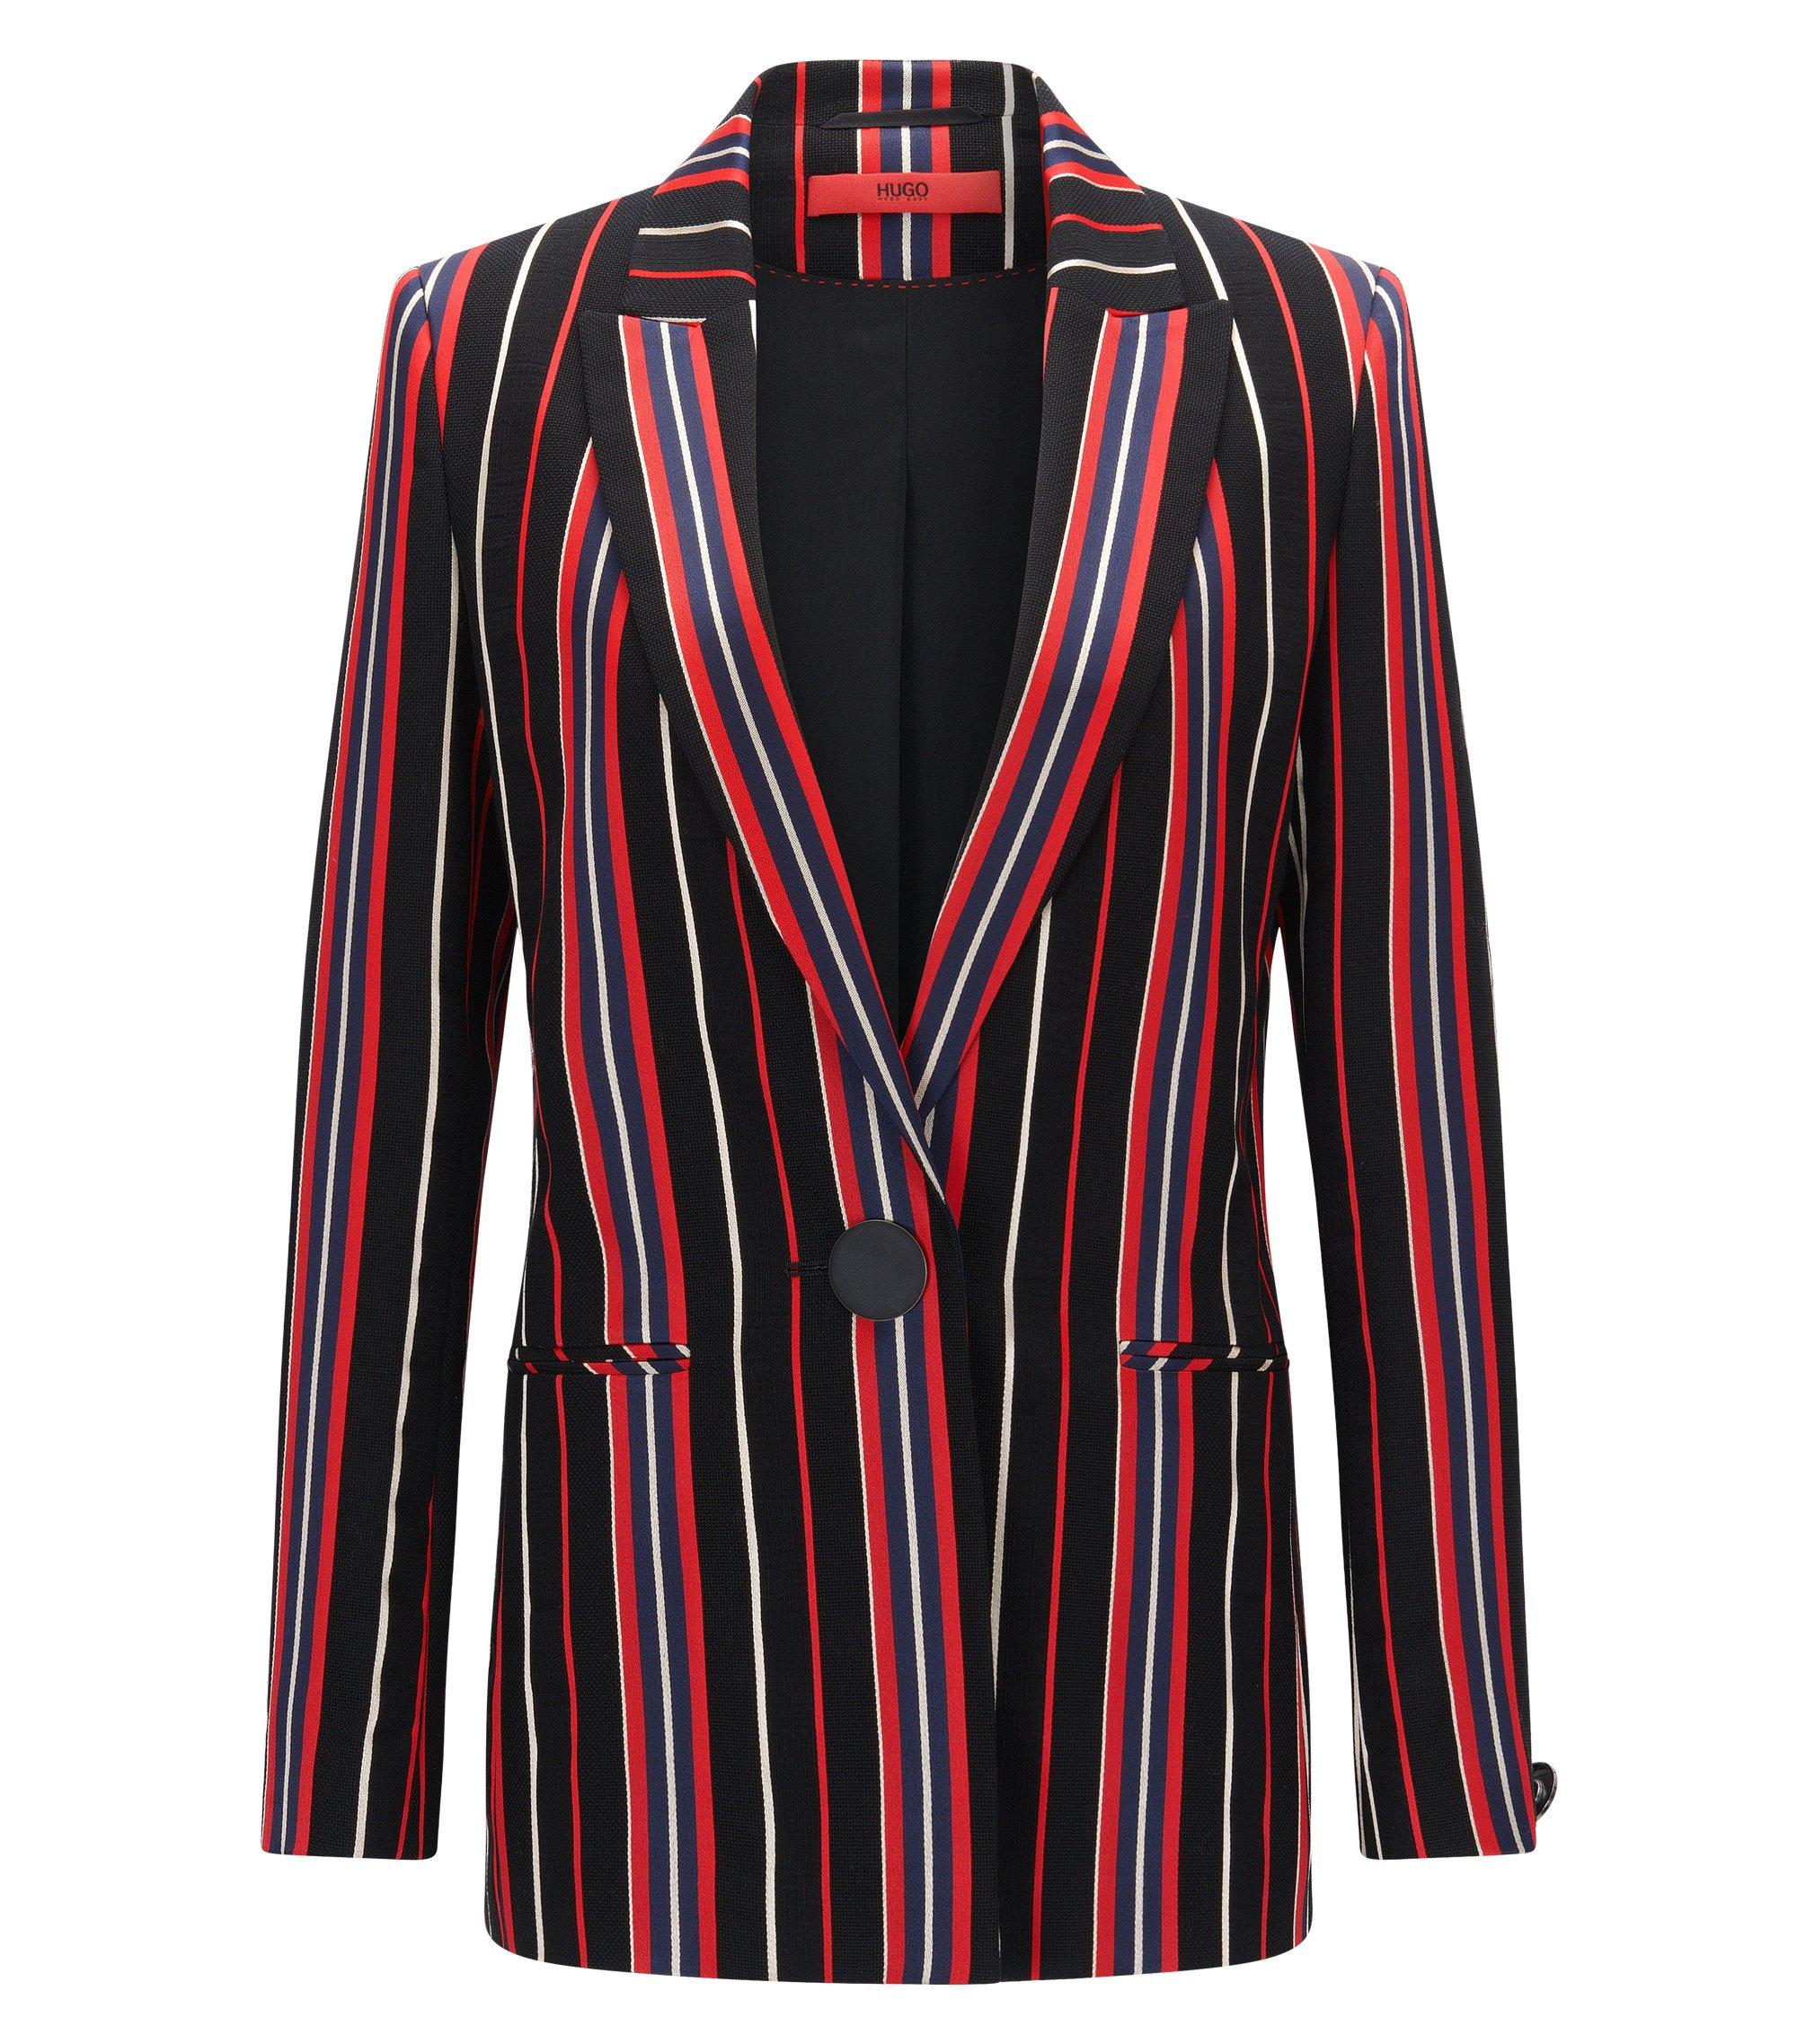 Regular-fit jacket in a striped cotton blend, Patterned